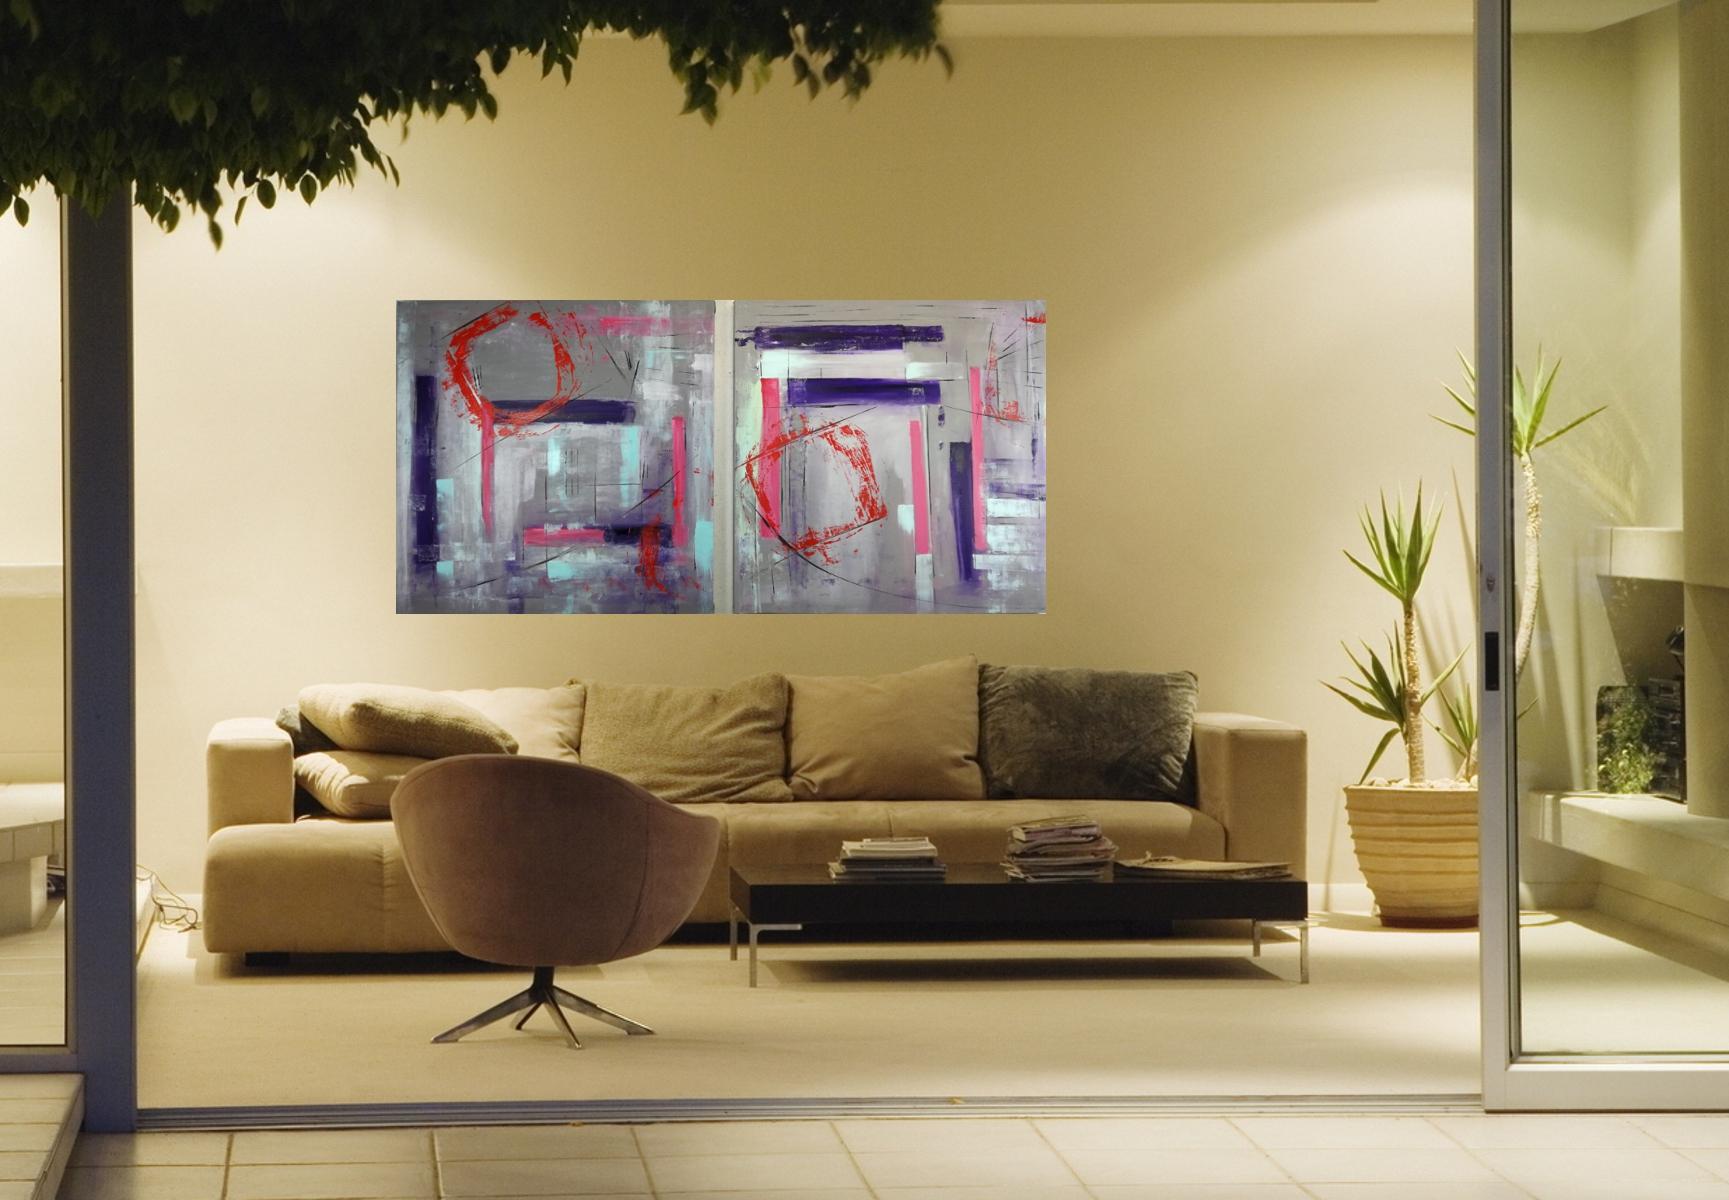 quadri astatti 362.jpg - quadro astratto geometrico due tele 100x100x4 cm